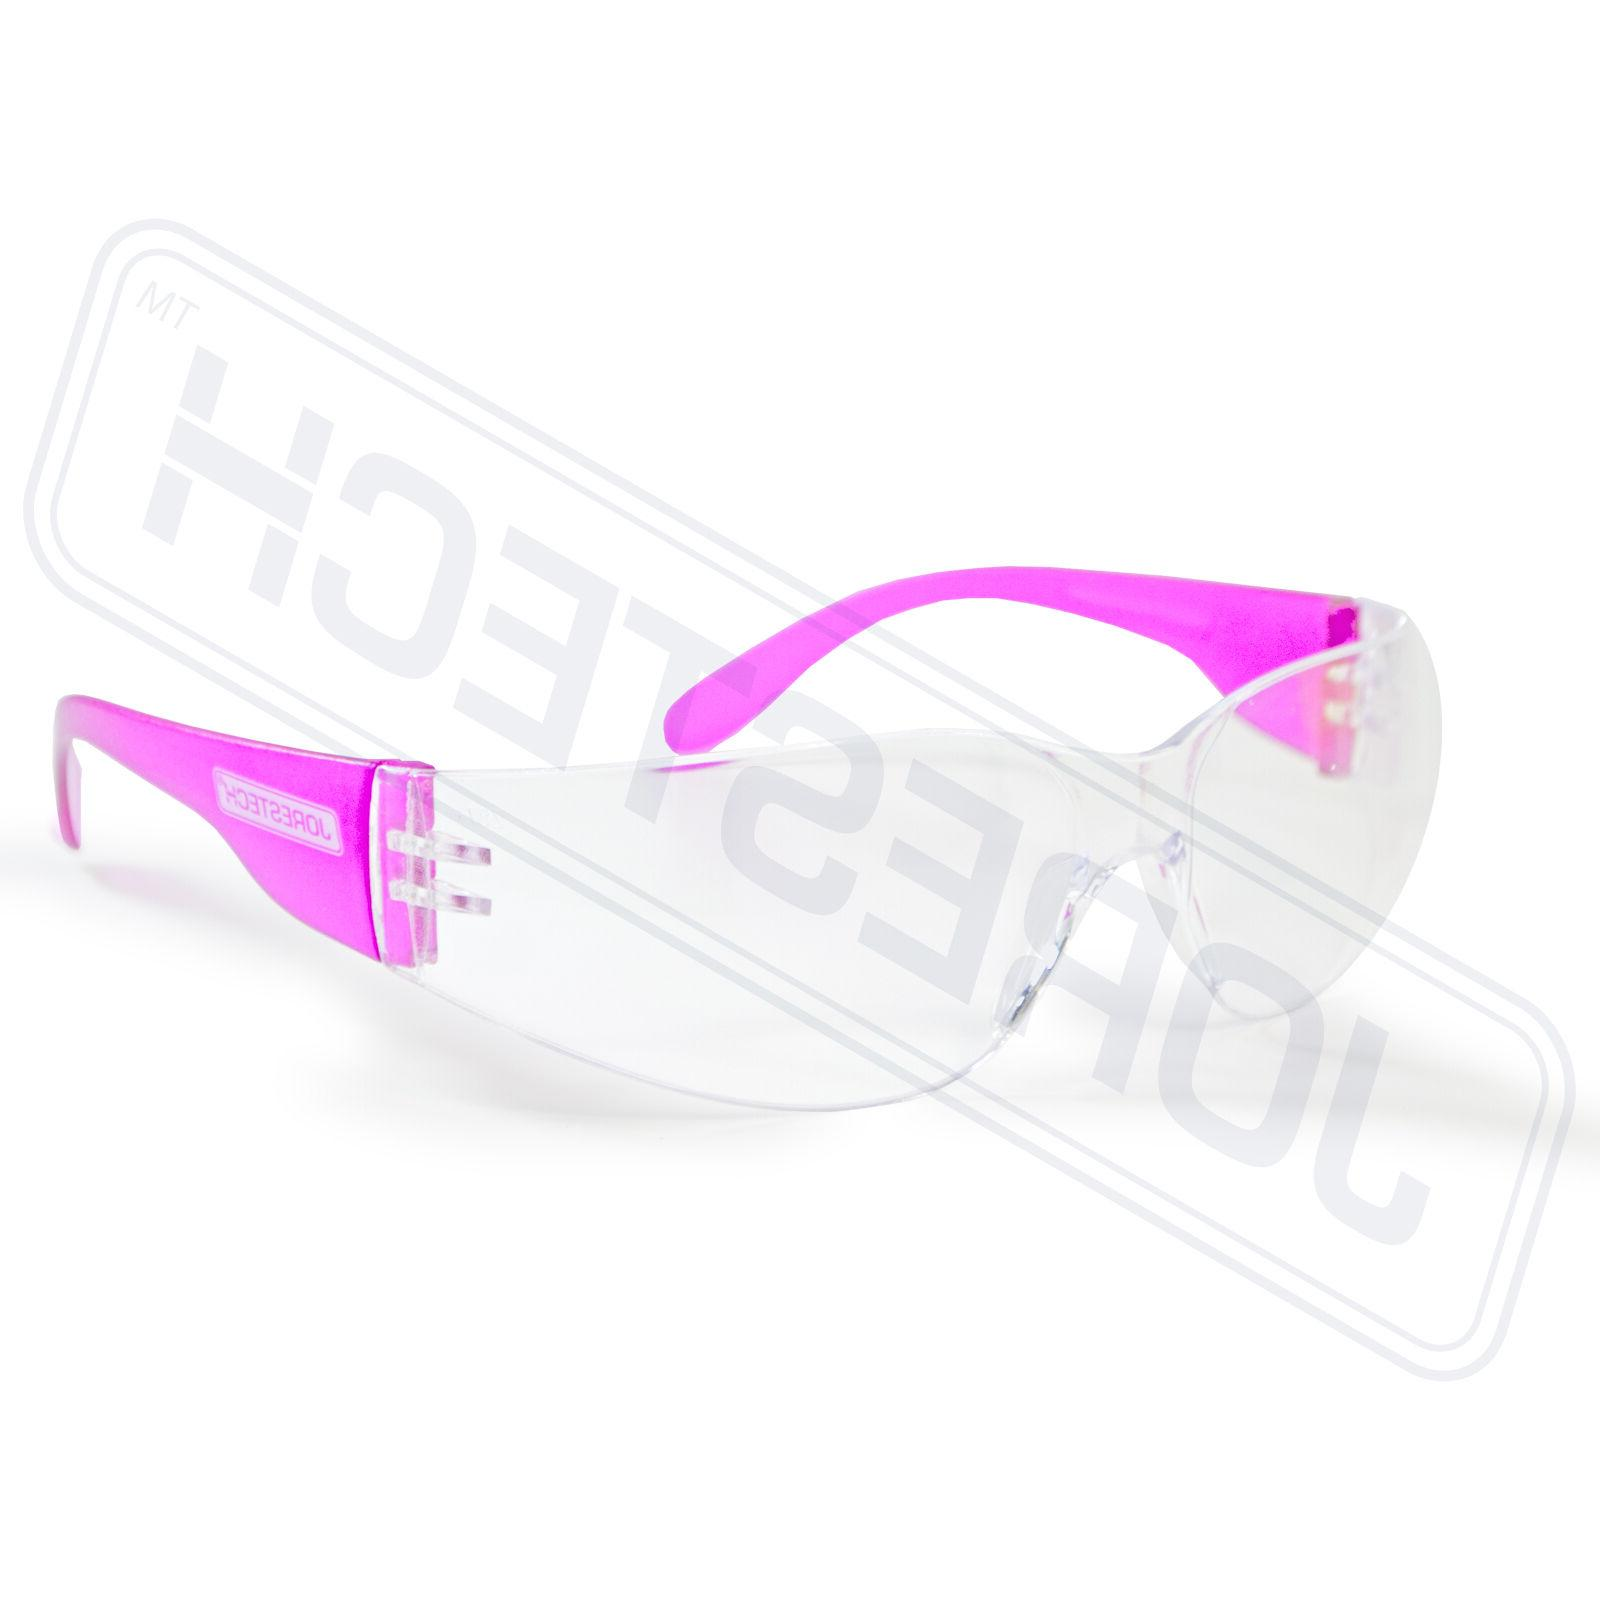 Jorestech Women's Safety Glasses | Pink | Lens